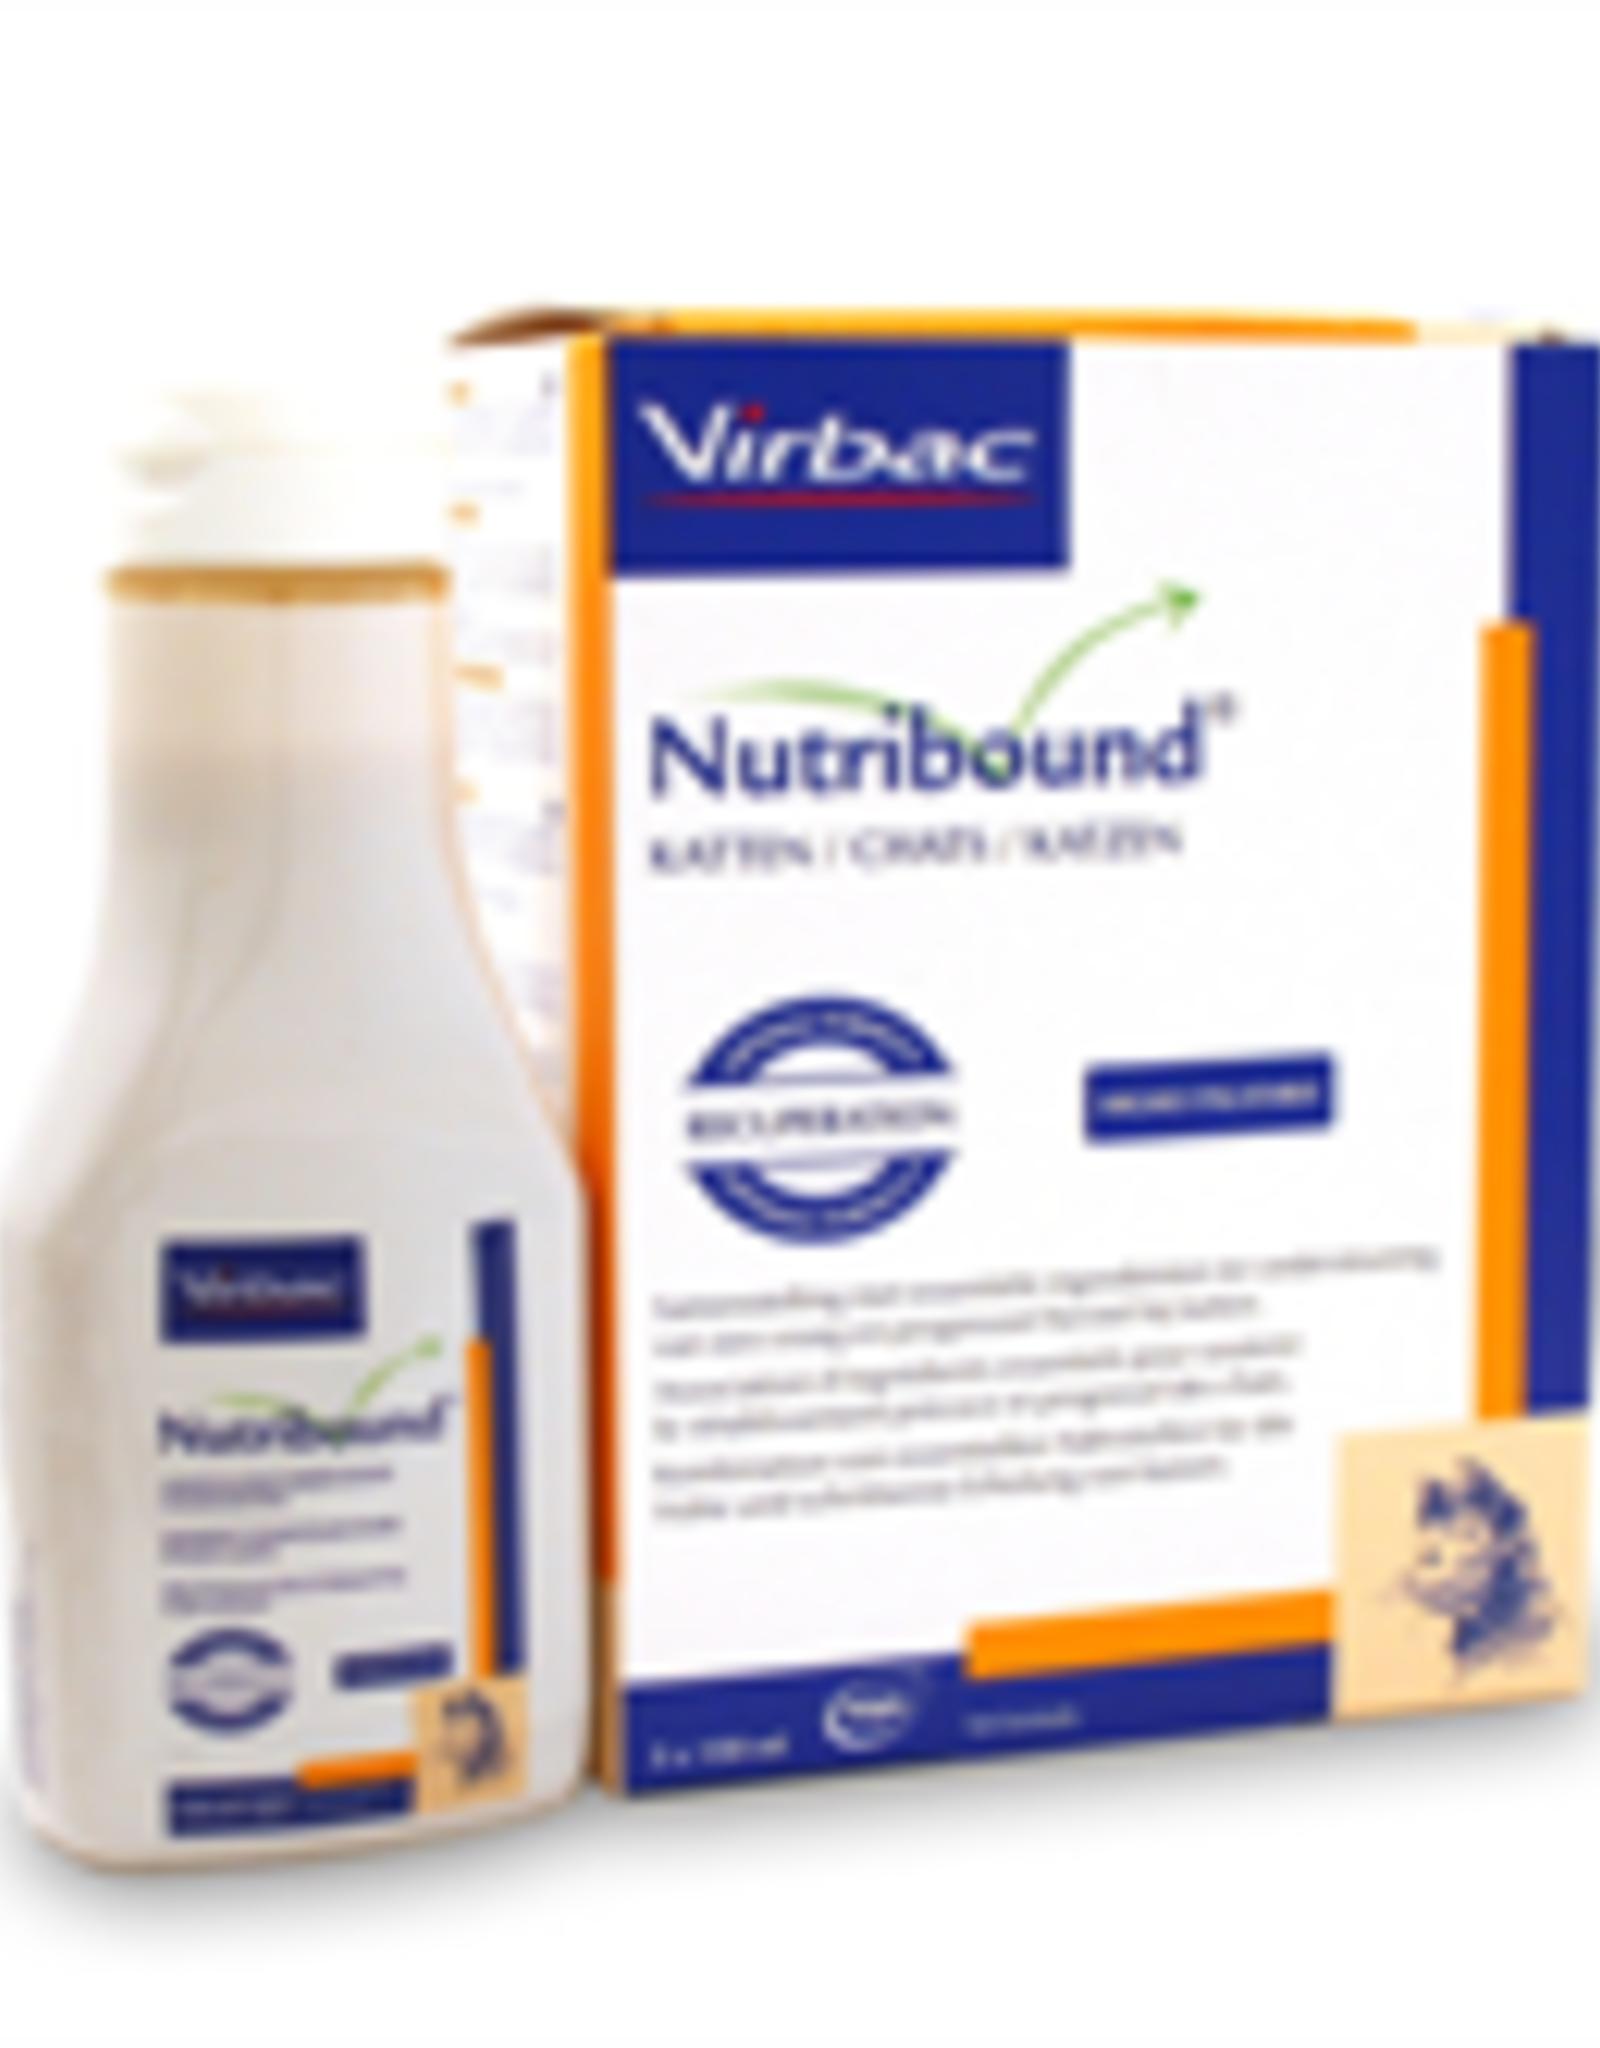 Virbac Virbac Nutribound 3x150ml Katze